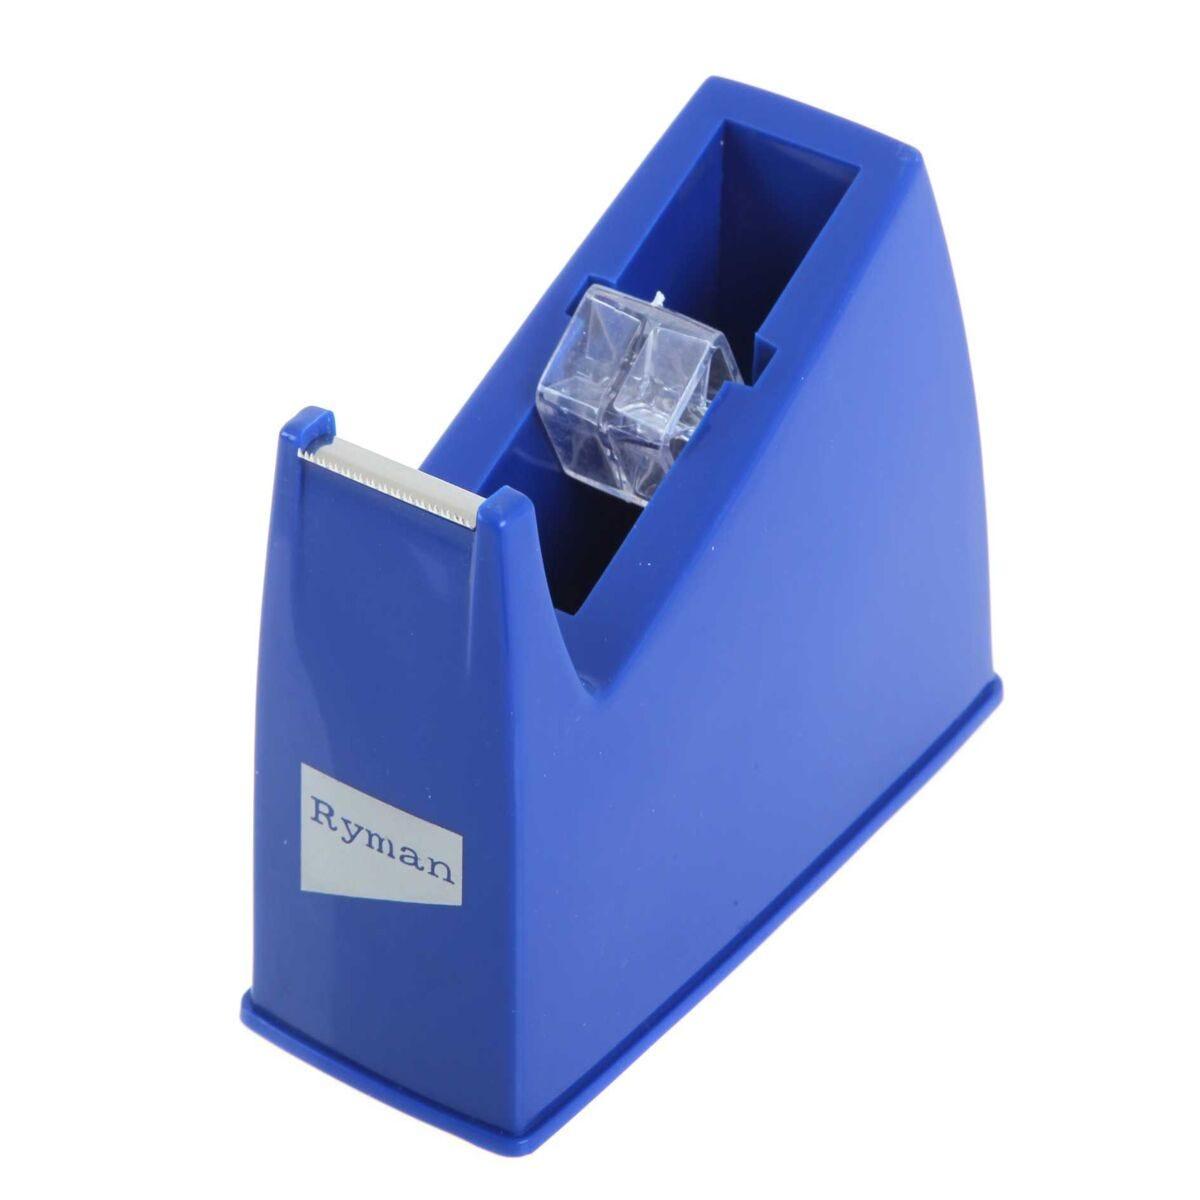 Ryman Tape Dispenser Medium Blue